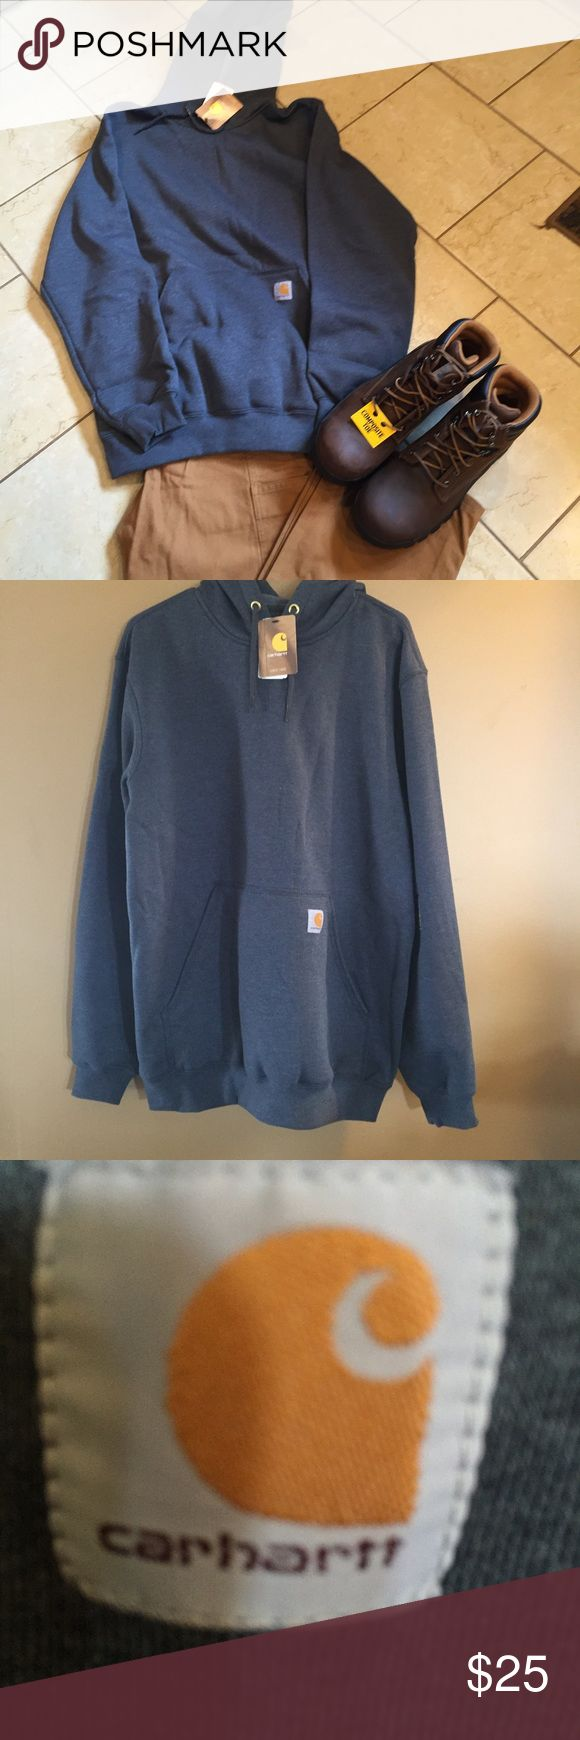 Men's Carhartt sweatshirt, NWT, size medium Men's Carhartt sweatshirt, NWT, size medium, original fit, grey, comes from a smoke free home. Carhartt Shirts Sweatshirts & Hoodies